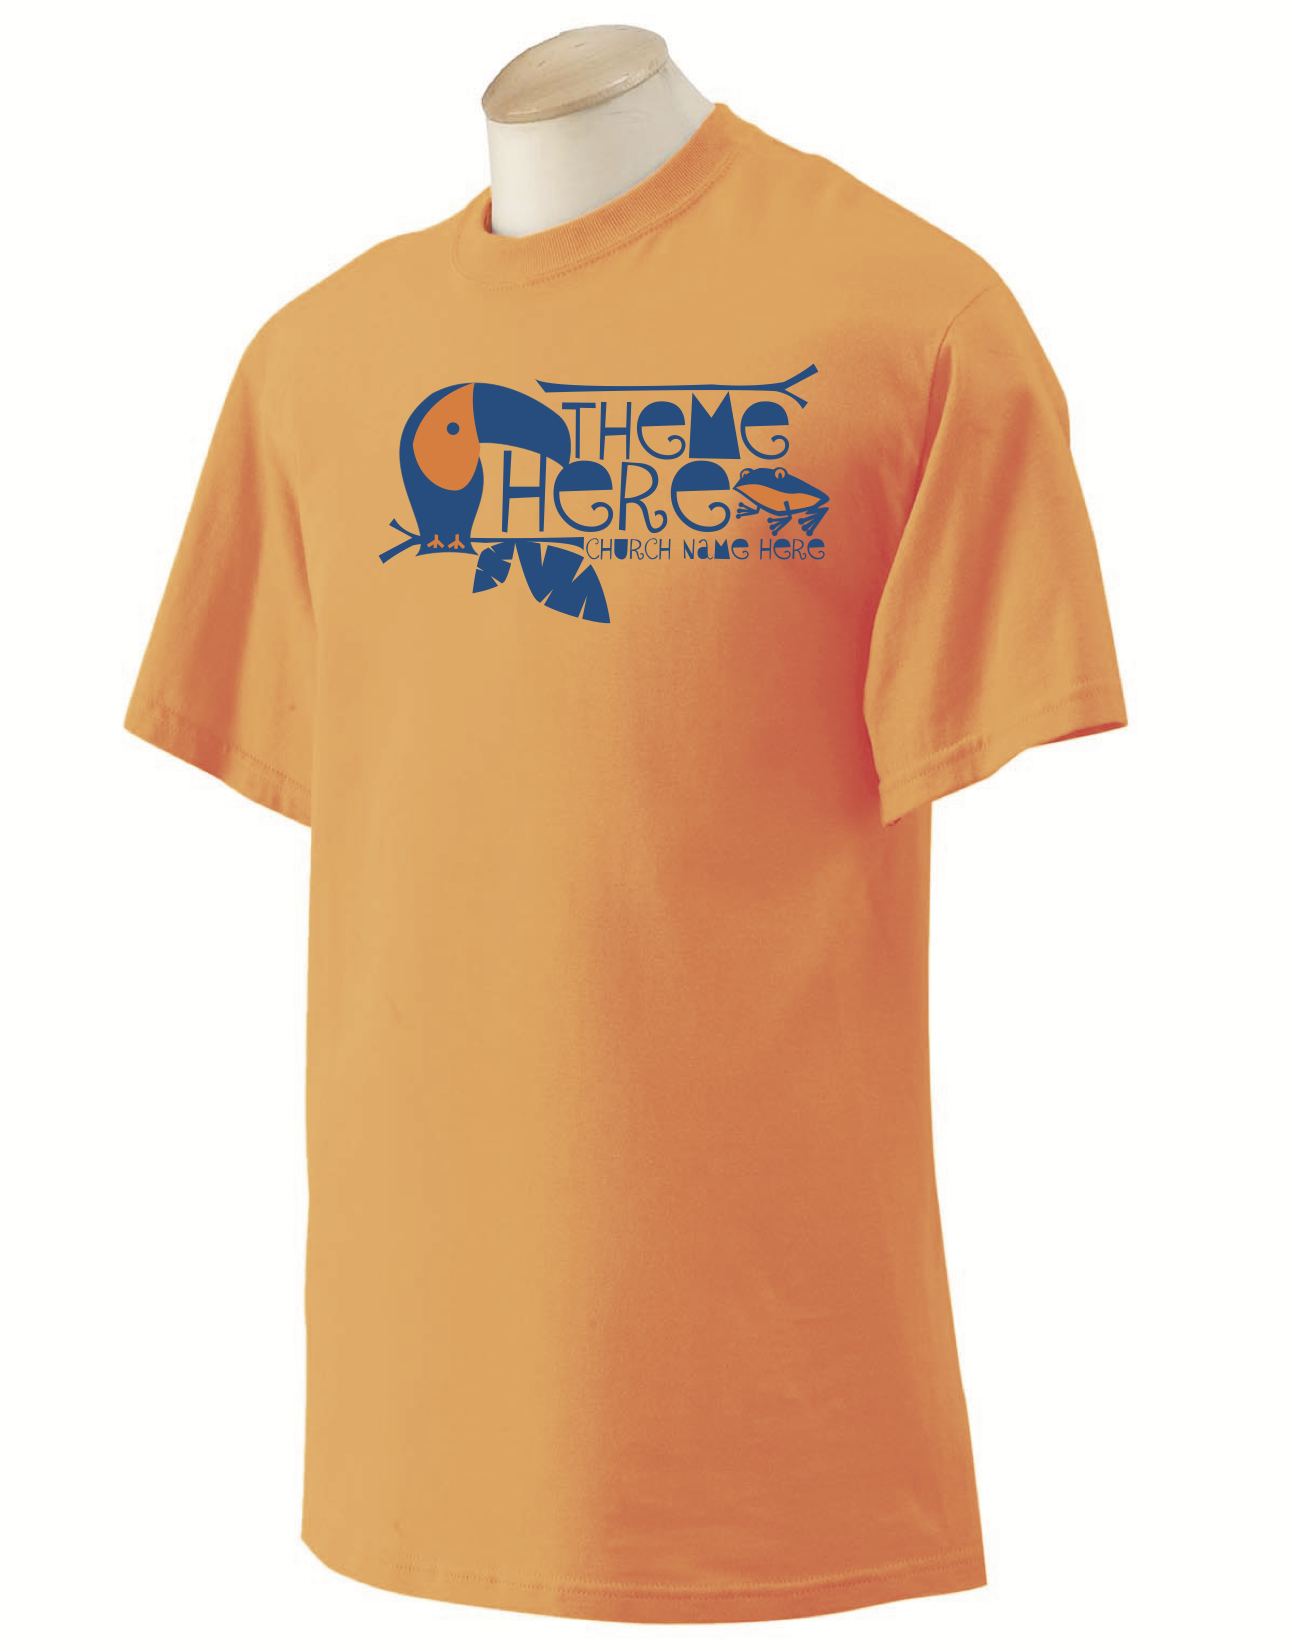 rainforest 1 orange shirt.jpg